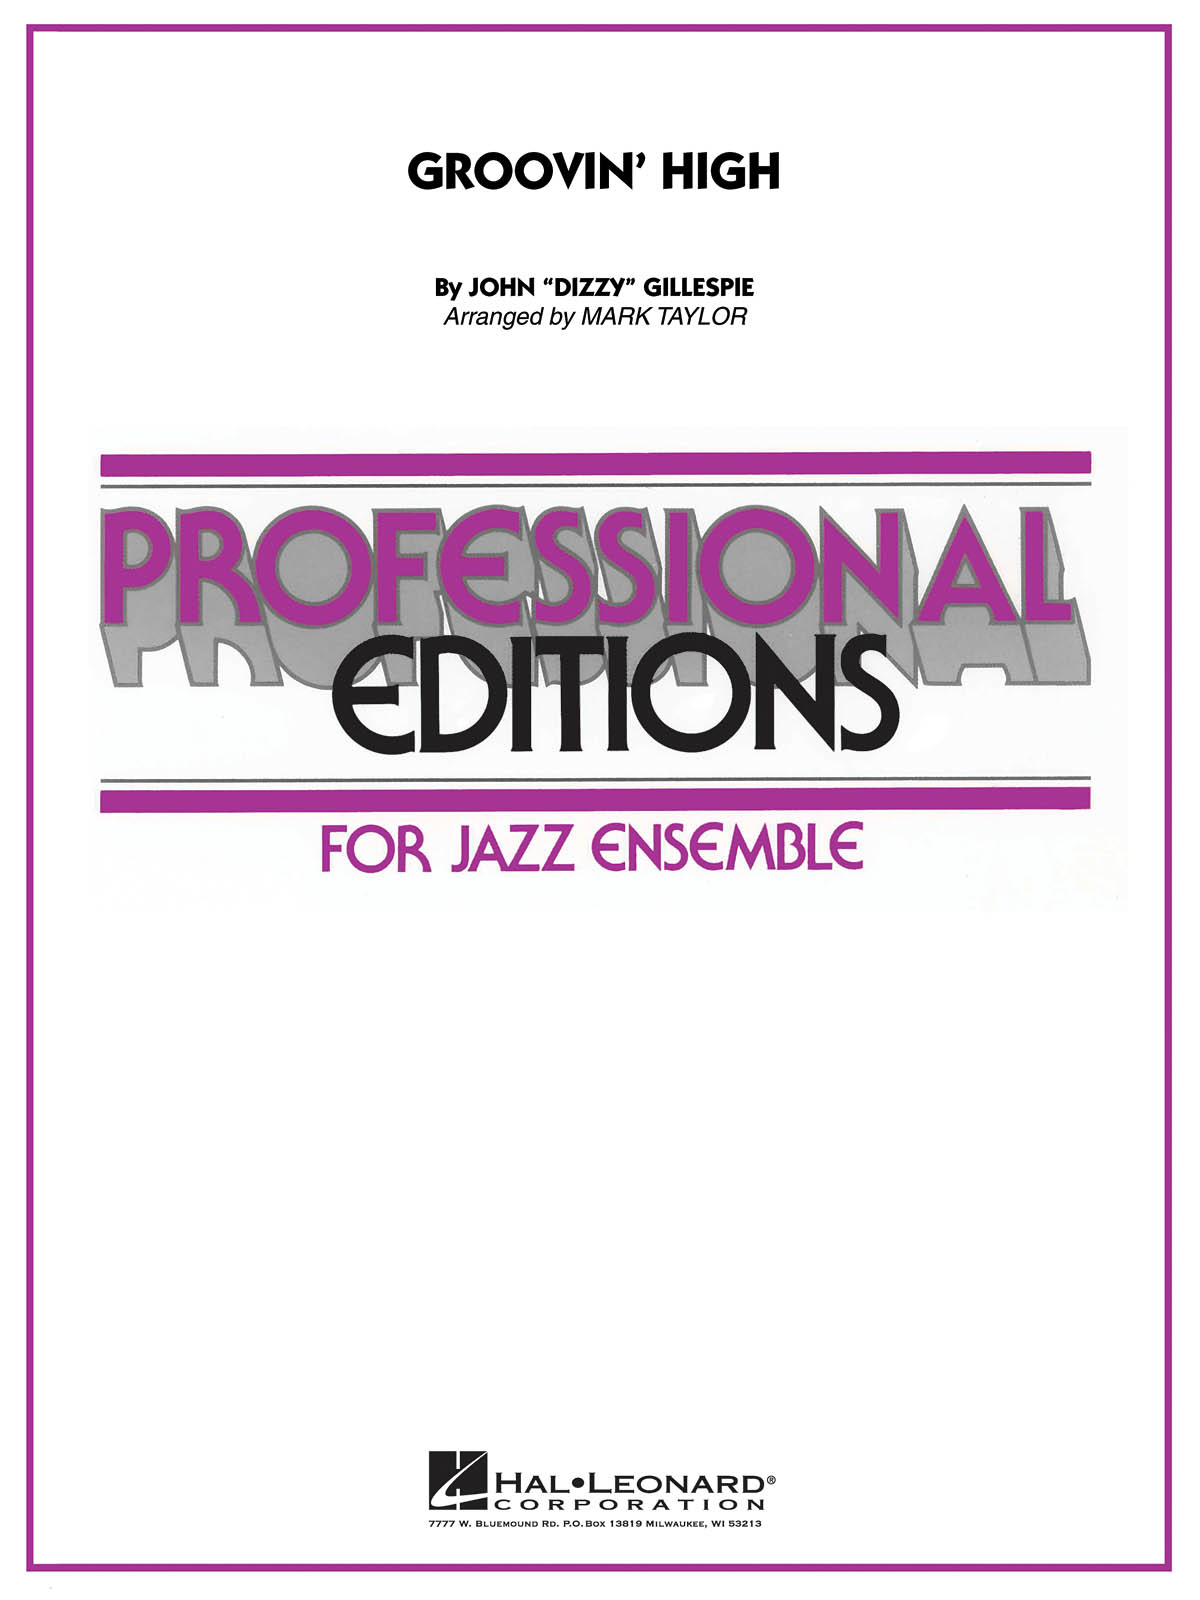 Dizzy Gillespie: Groovin' High: Jazz Ensemble: Score & Parts